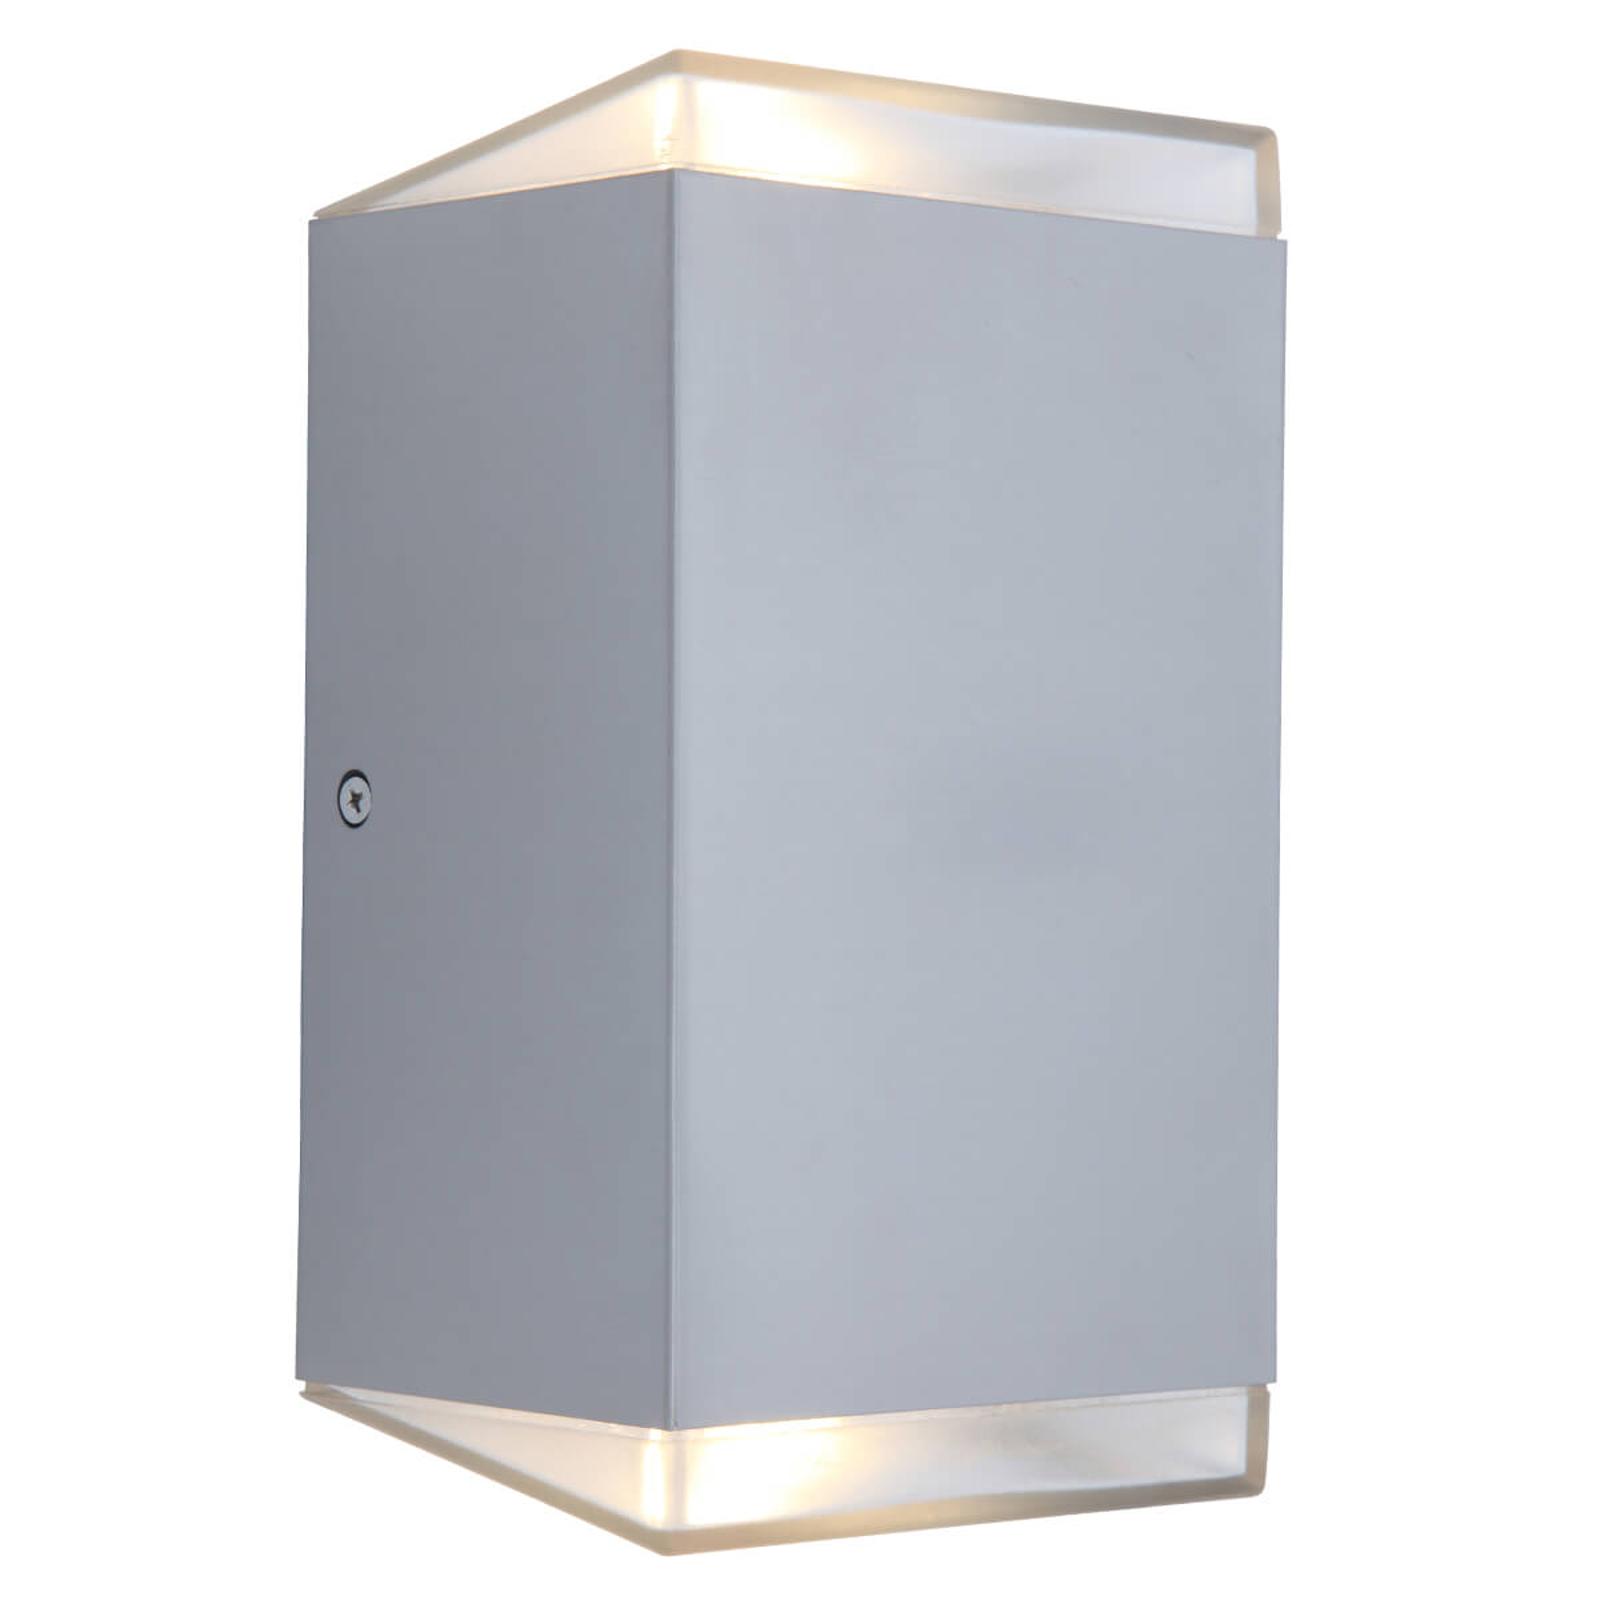 LED buitenwandlamp Path, kubus, zonder sensor